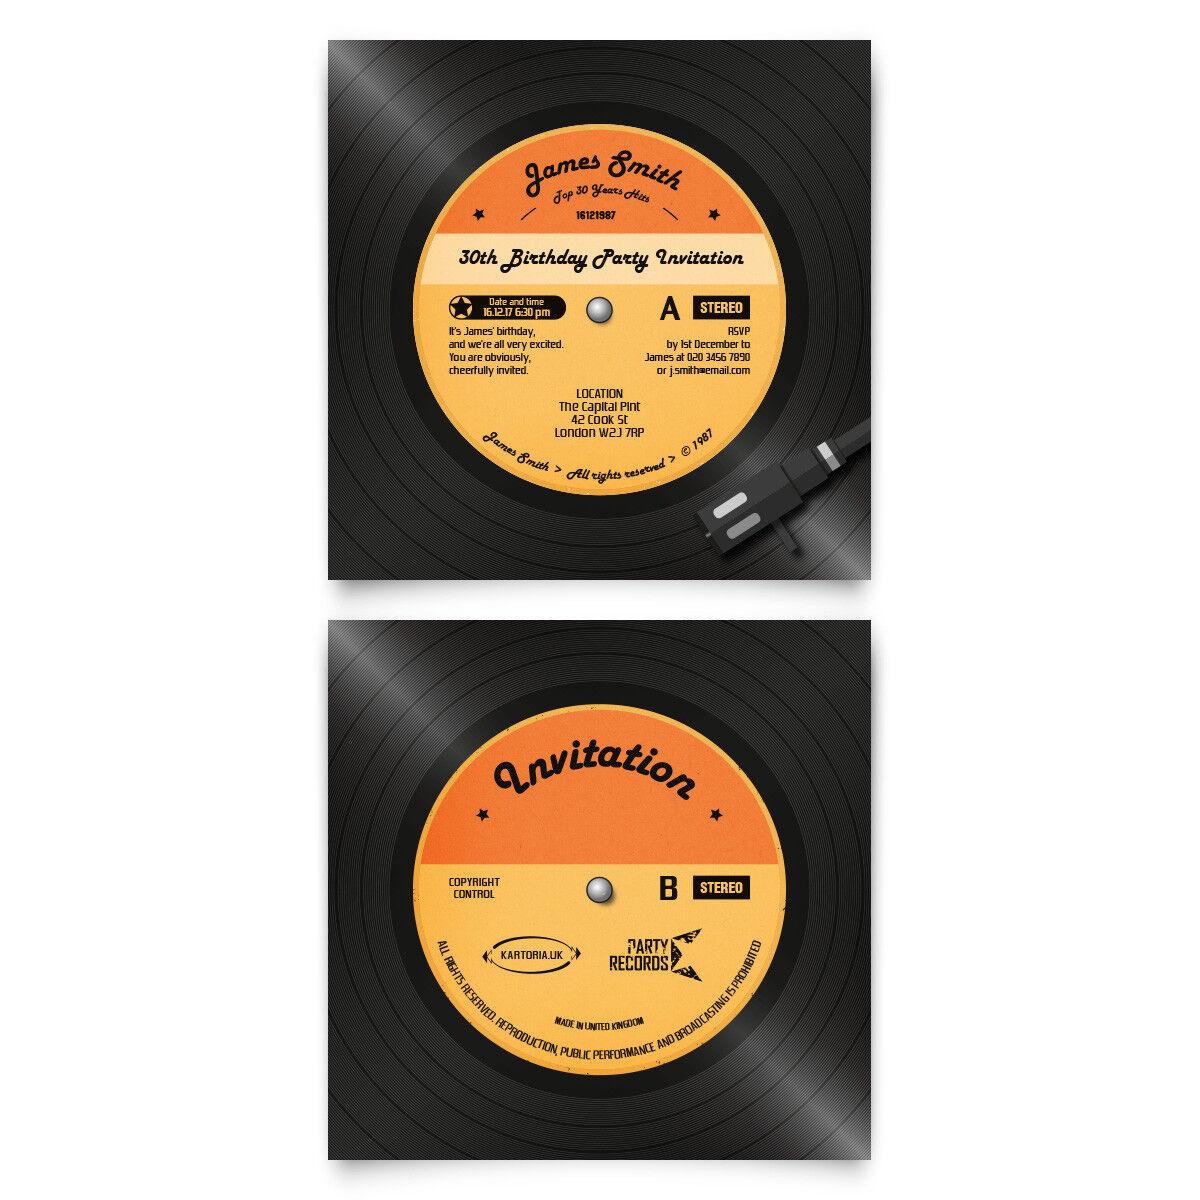 Invitation Cards Invite Birthday Party - Retro Vinyl Record Disk